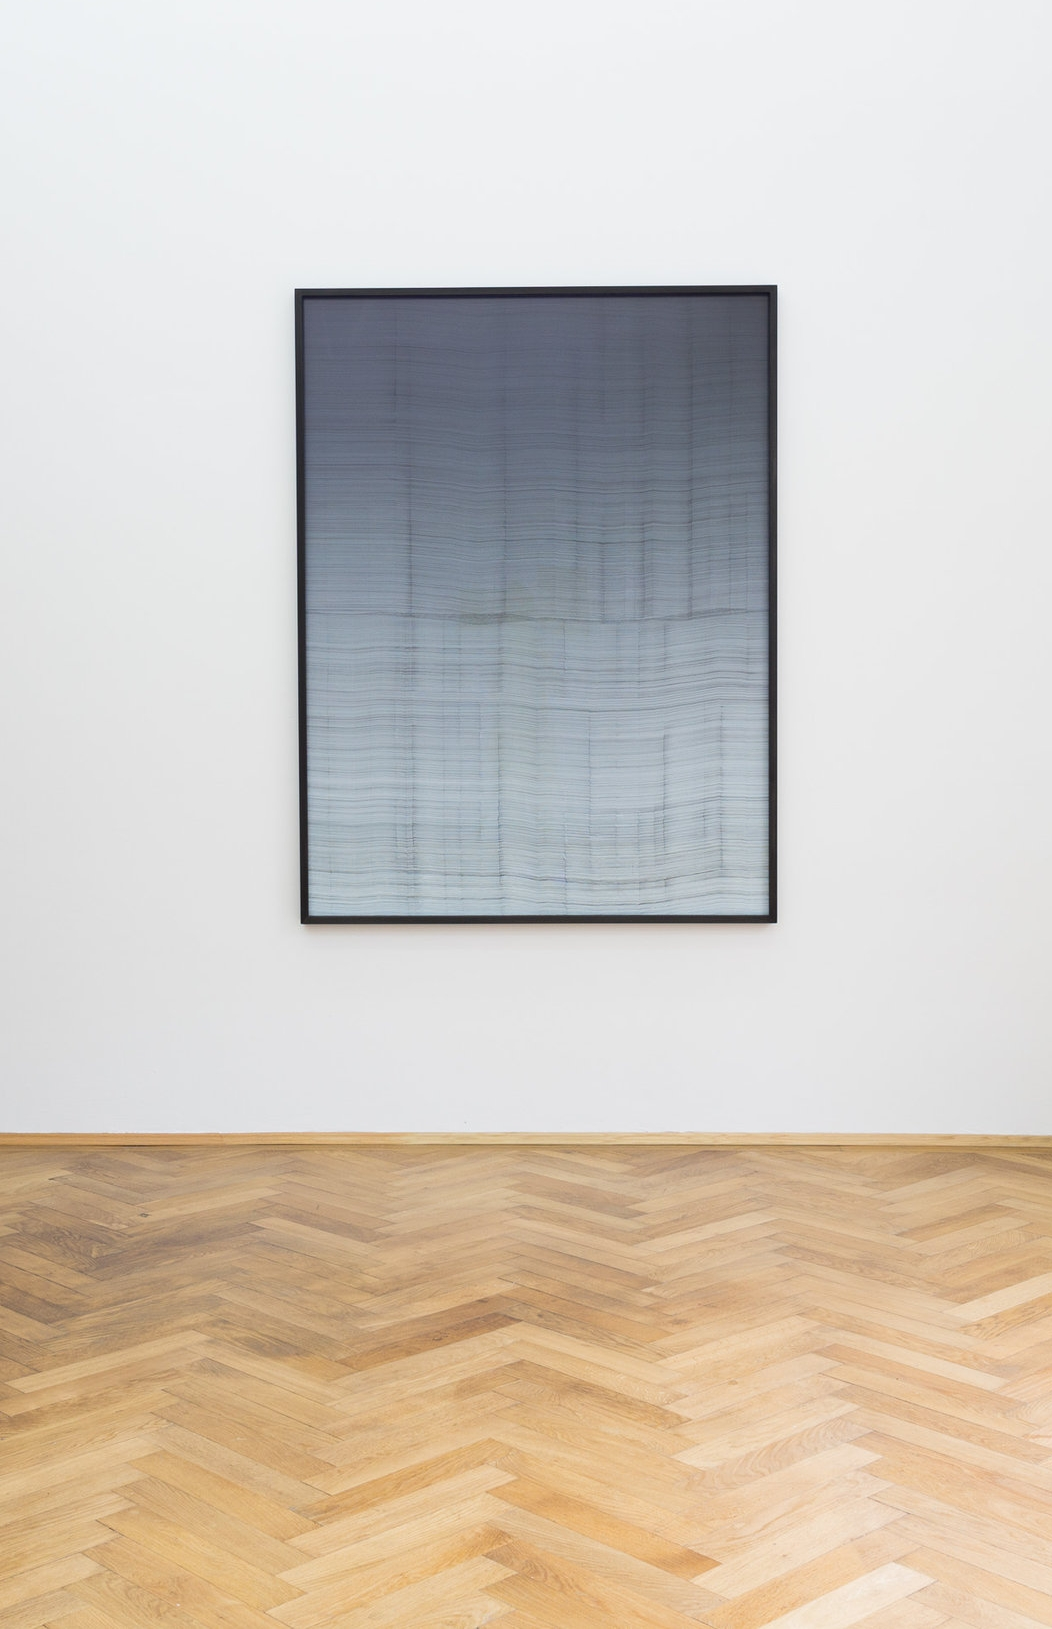 Anna Vogel, Translator XI, 2017, Indian ink on pigment print, 160 x 120 cm